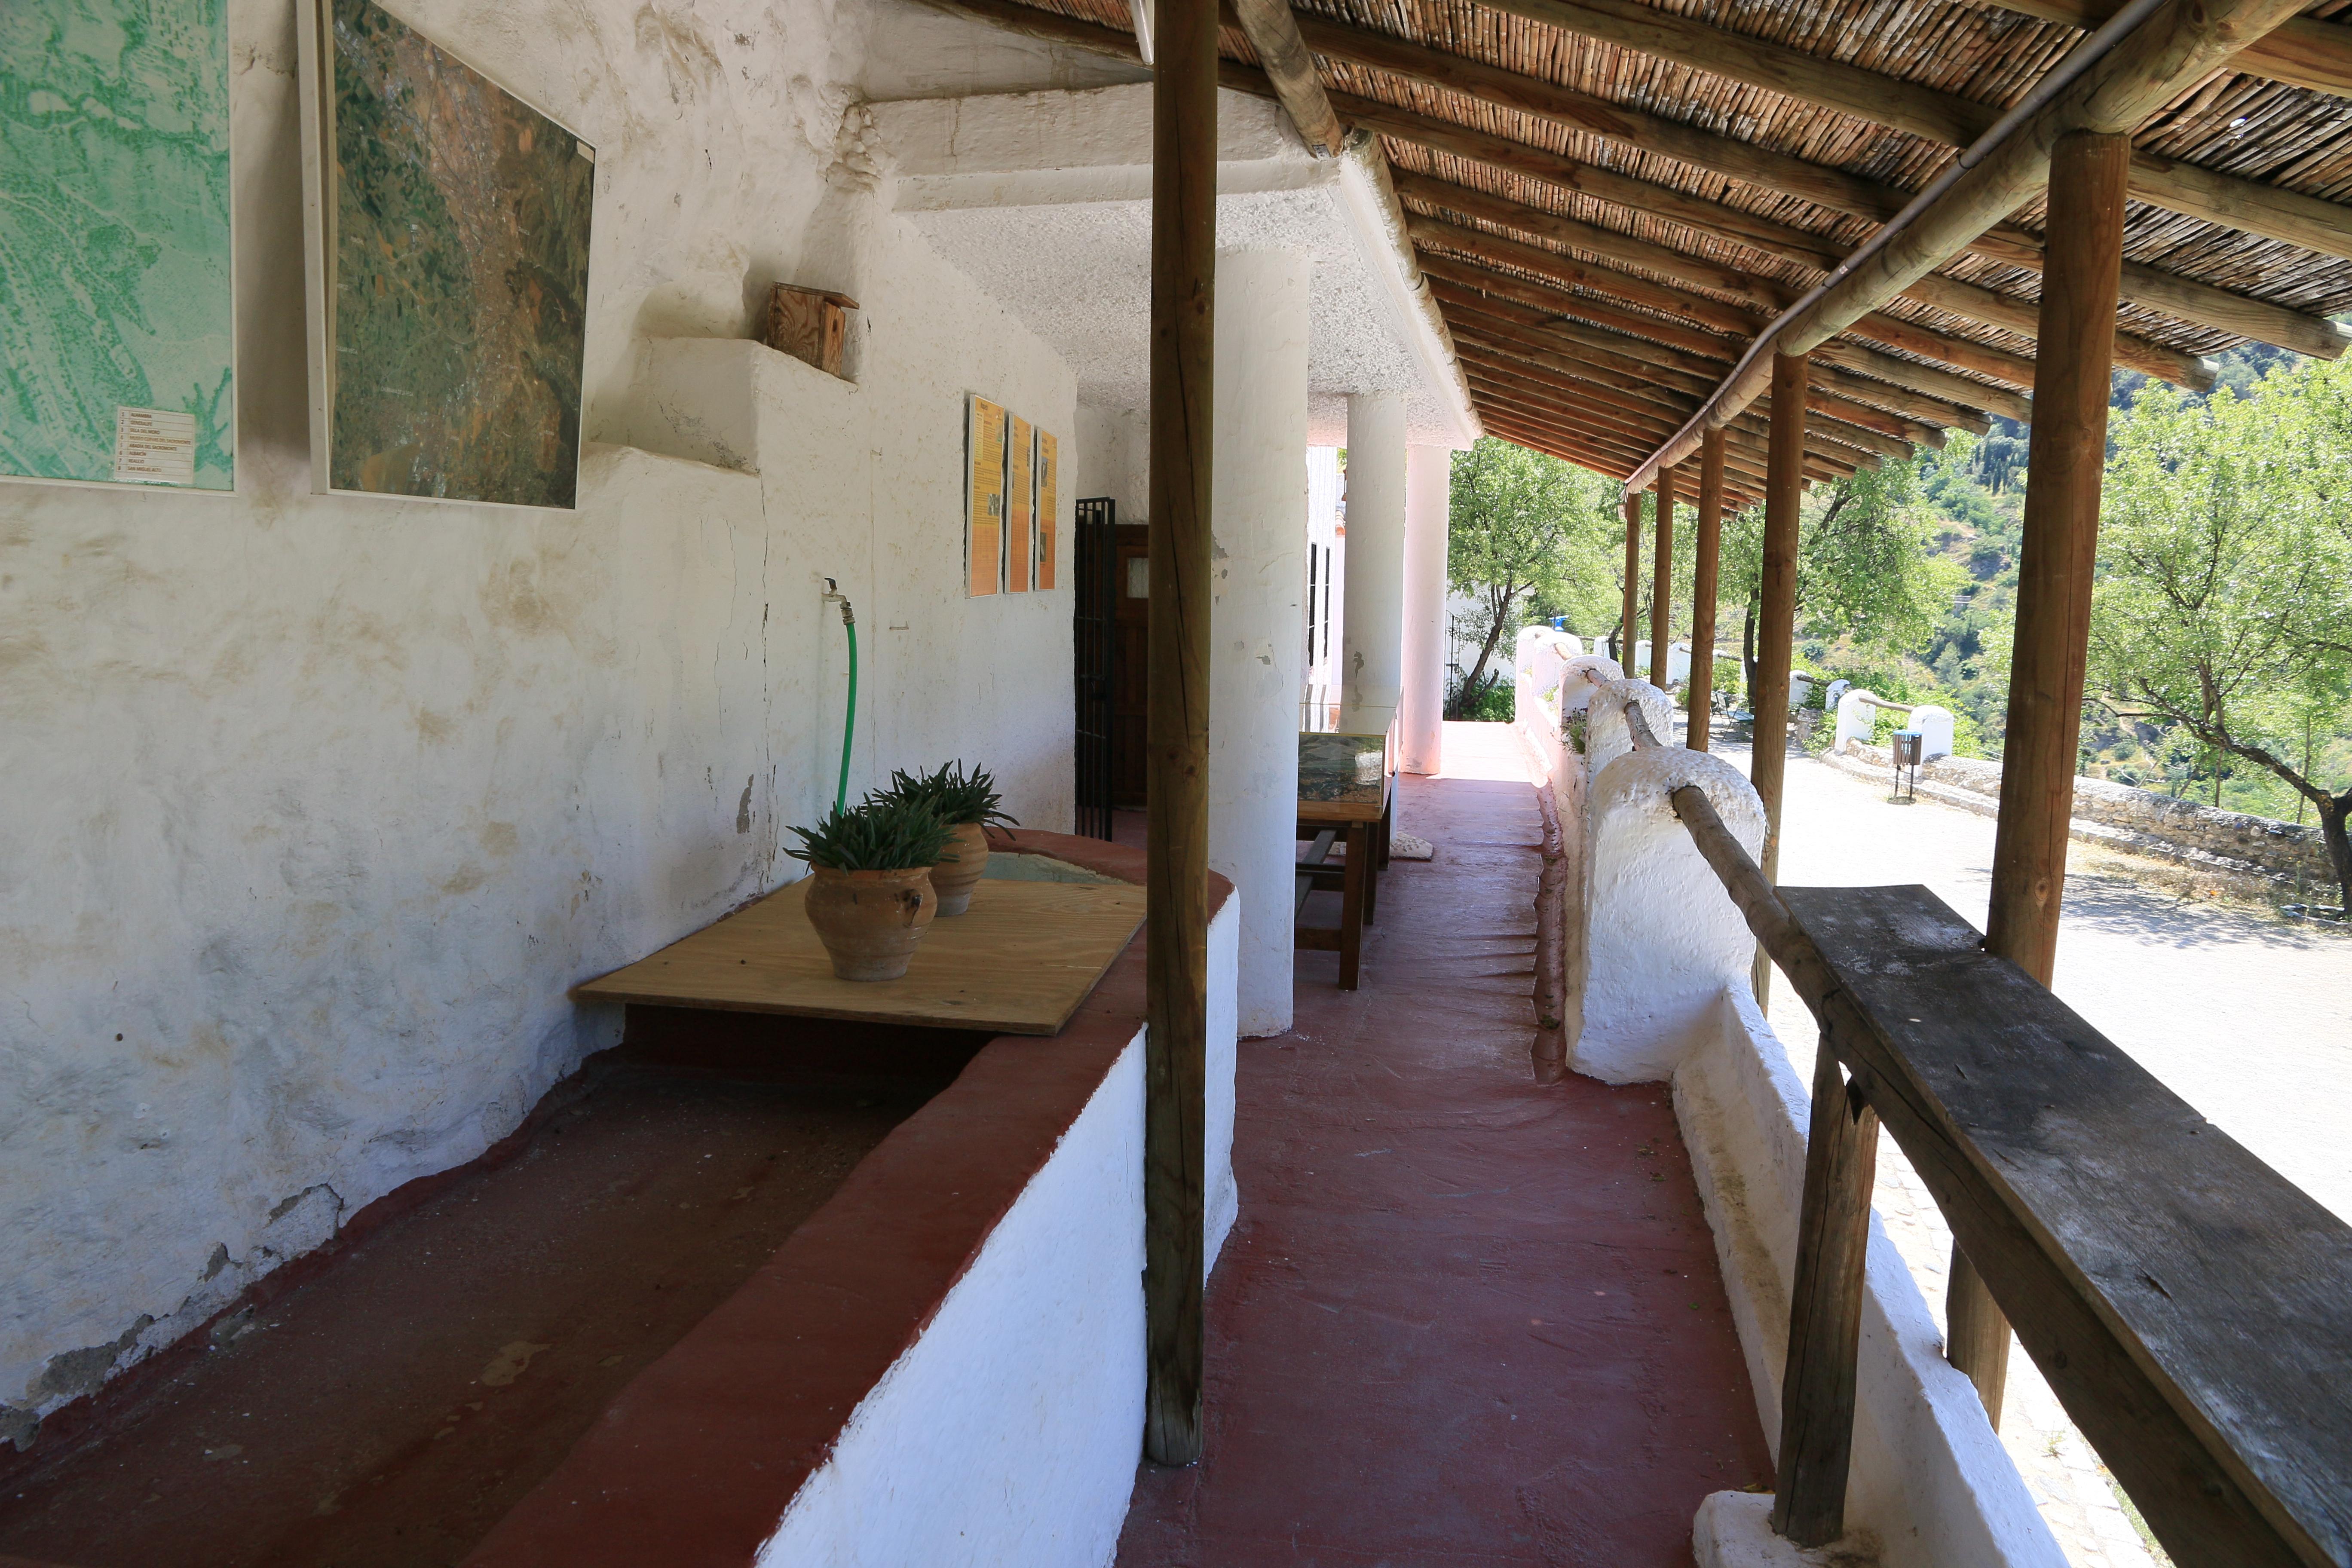 File:Aa interpretation centre in sacromonte - etnographical